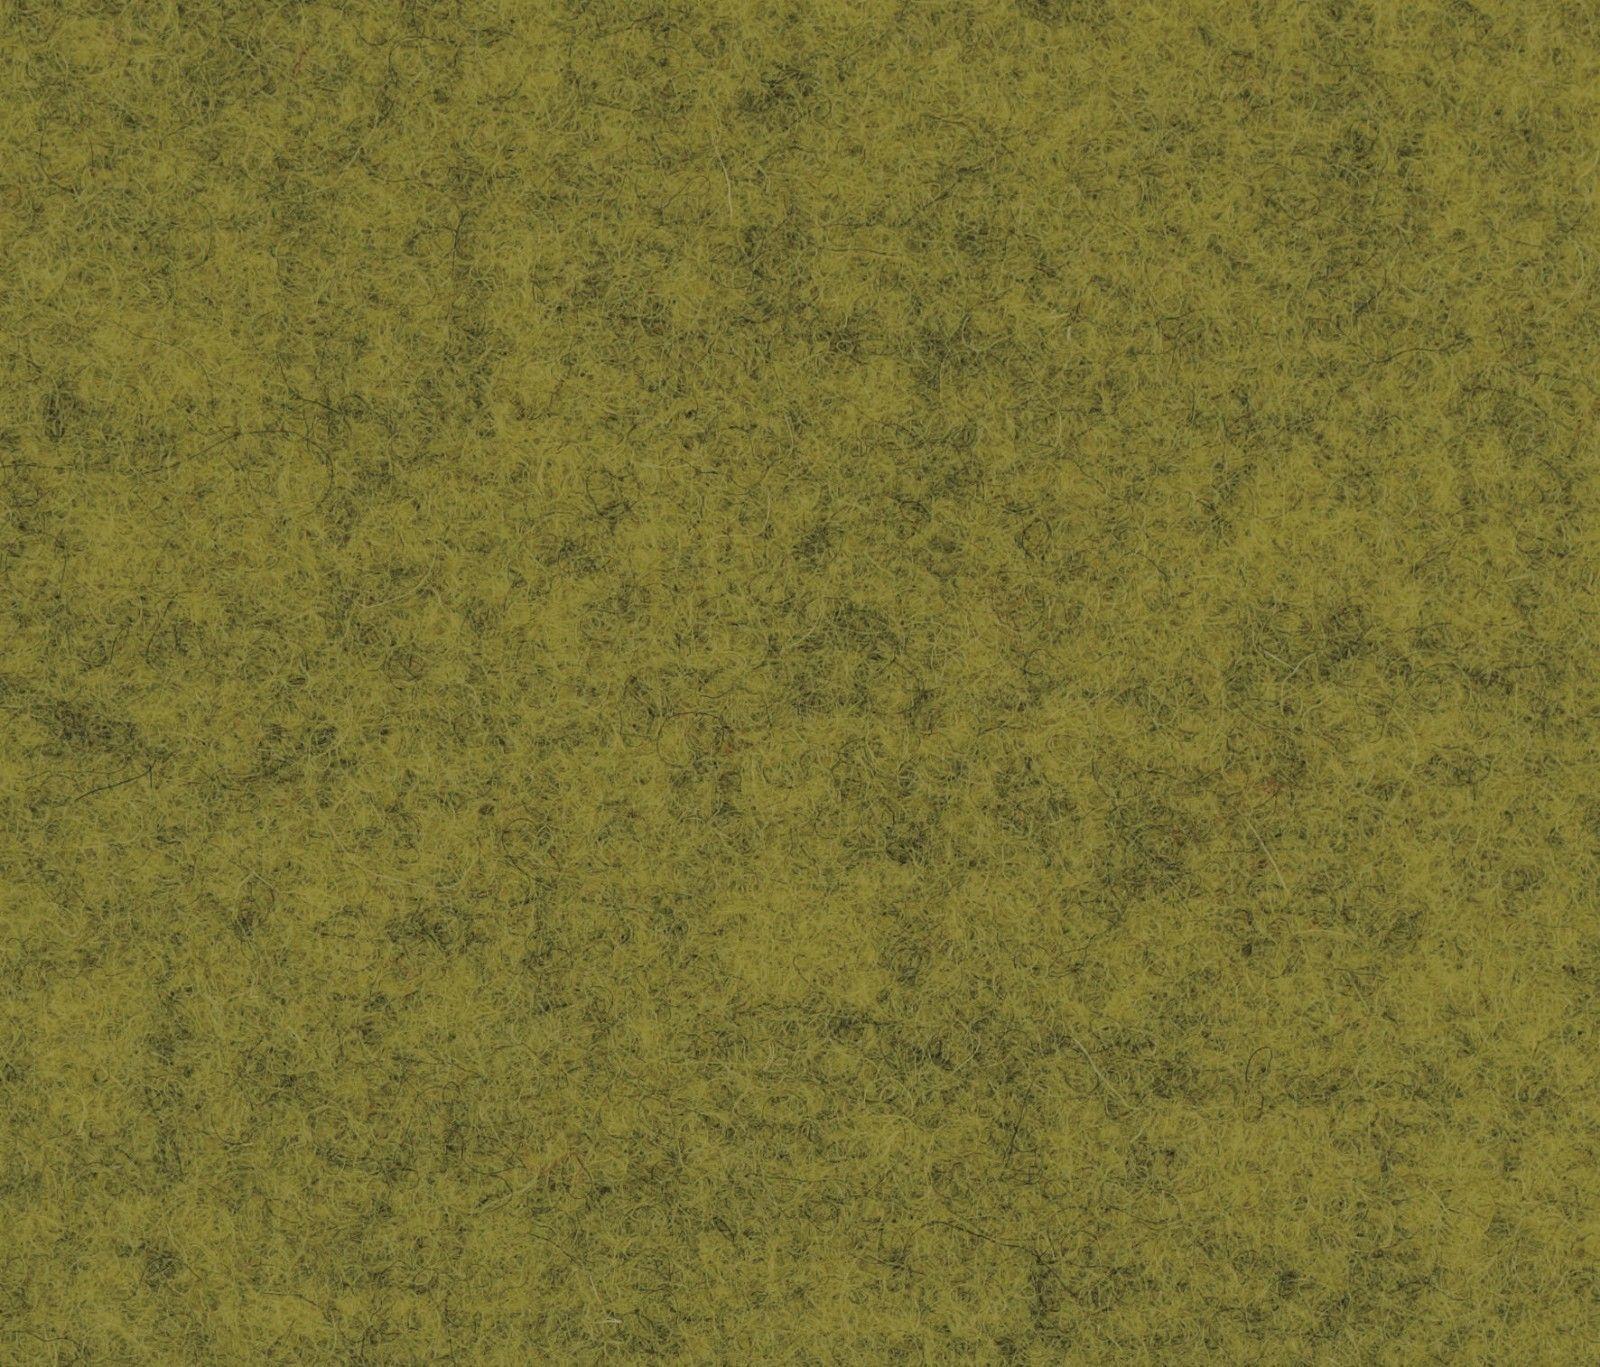 Camira Upholstery Fabric Blazer MCM Wool Camphill Green 2.125 yards CUZ1K NX